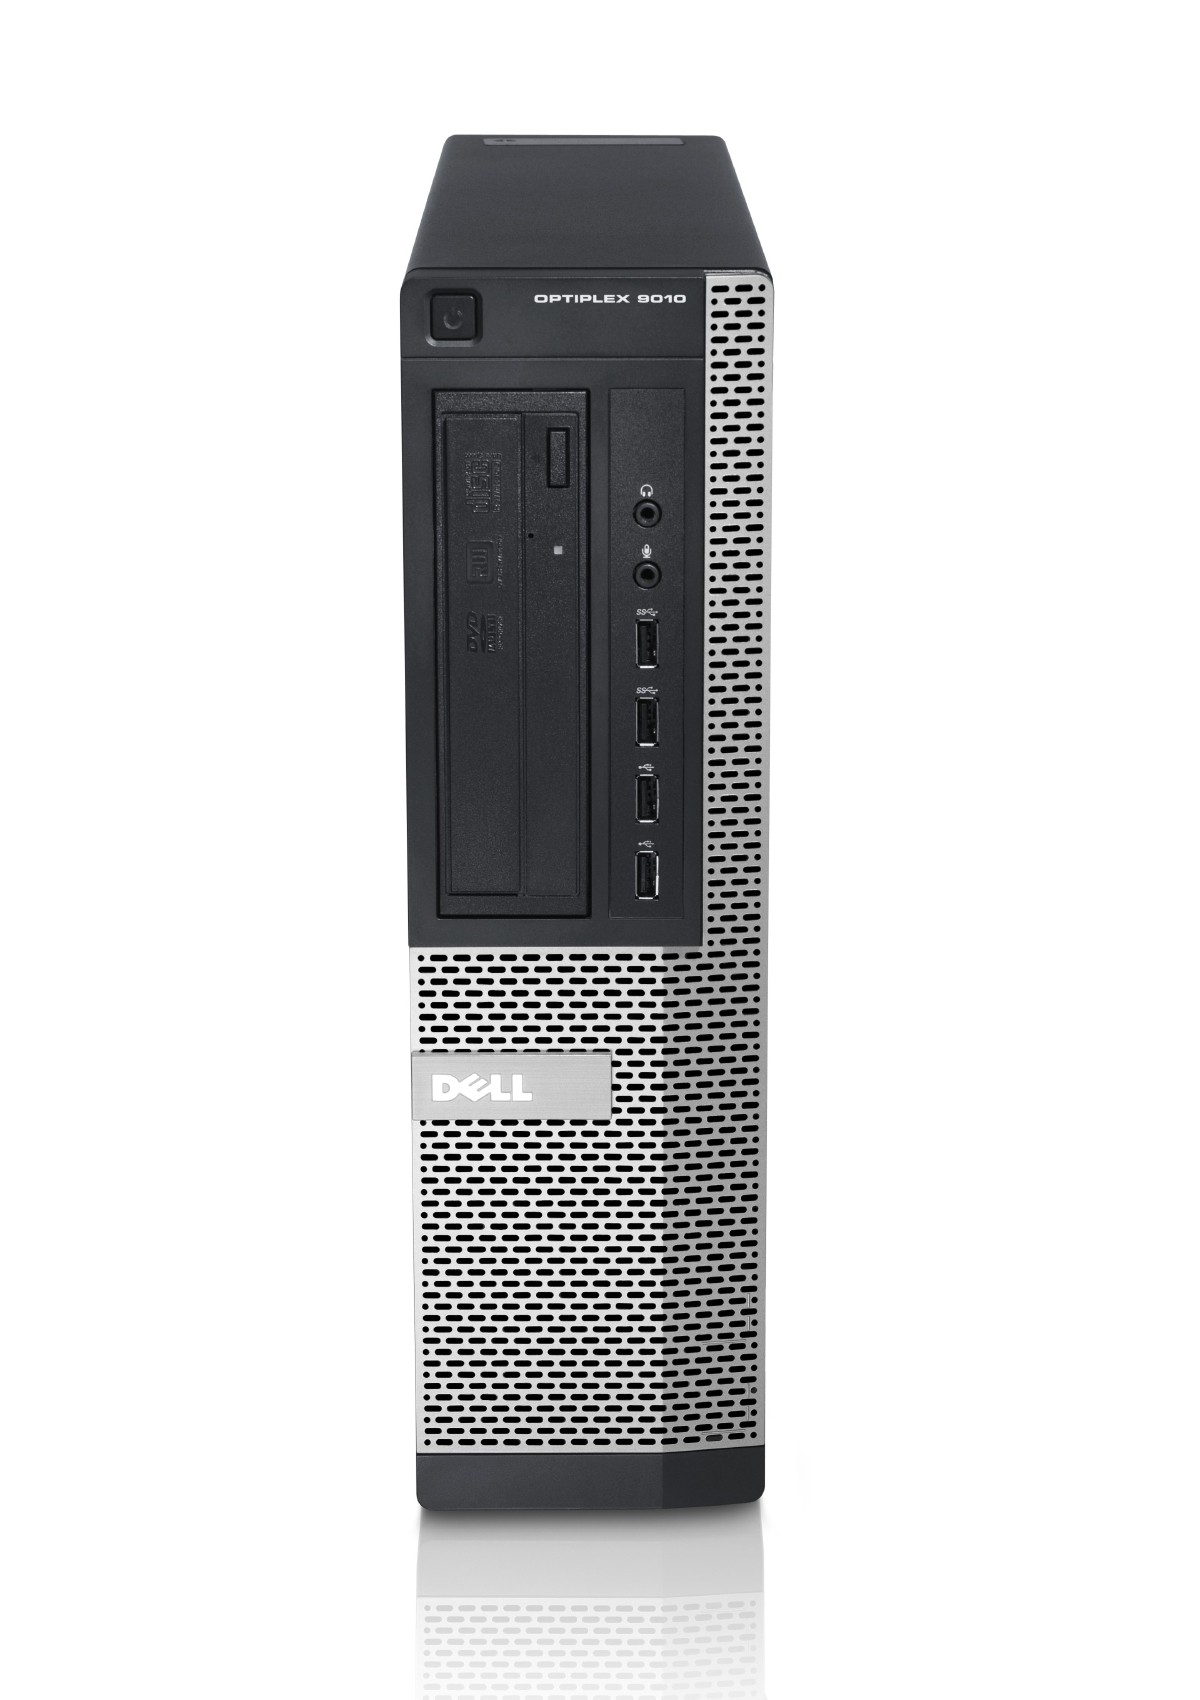 DELOPT9010DTi78128S1T-Dell Optiplex 9010 Desktop Intel Core i7 8GB RAM 128GB SSD + 1TB HDD DVD+RW with Windows 10 Pro Activated-image